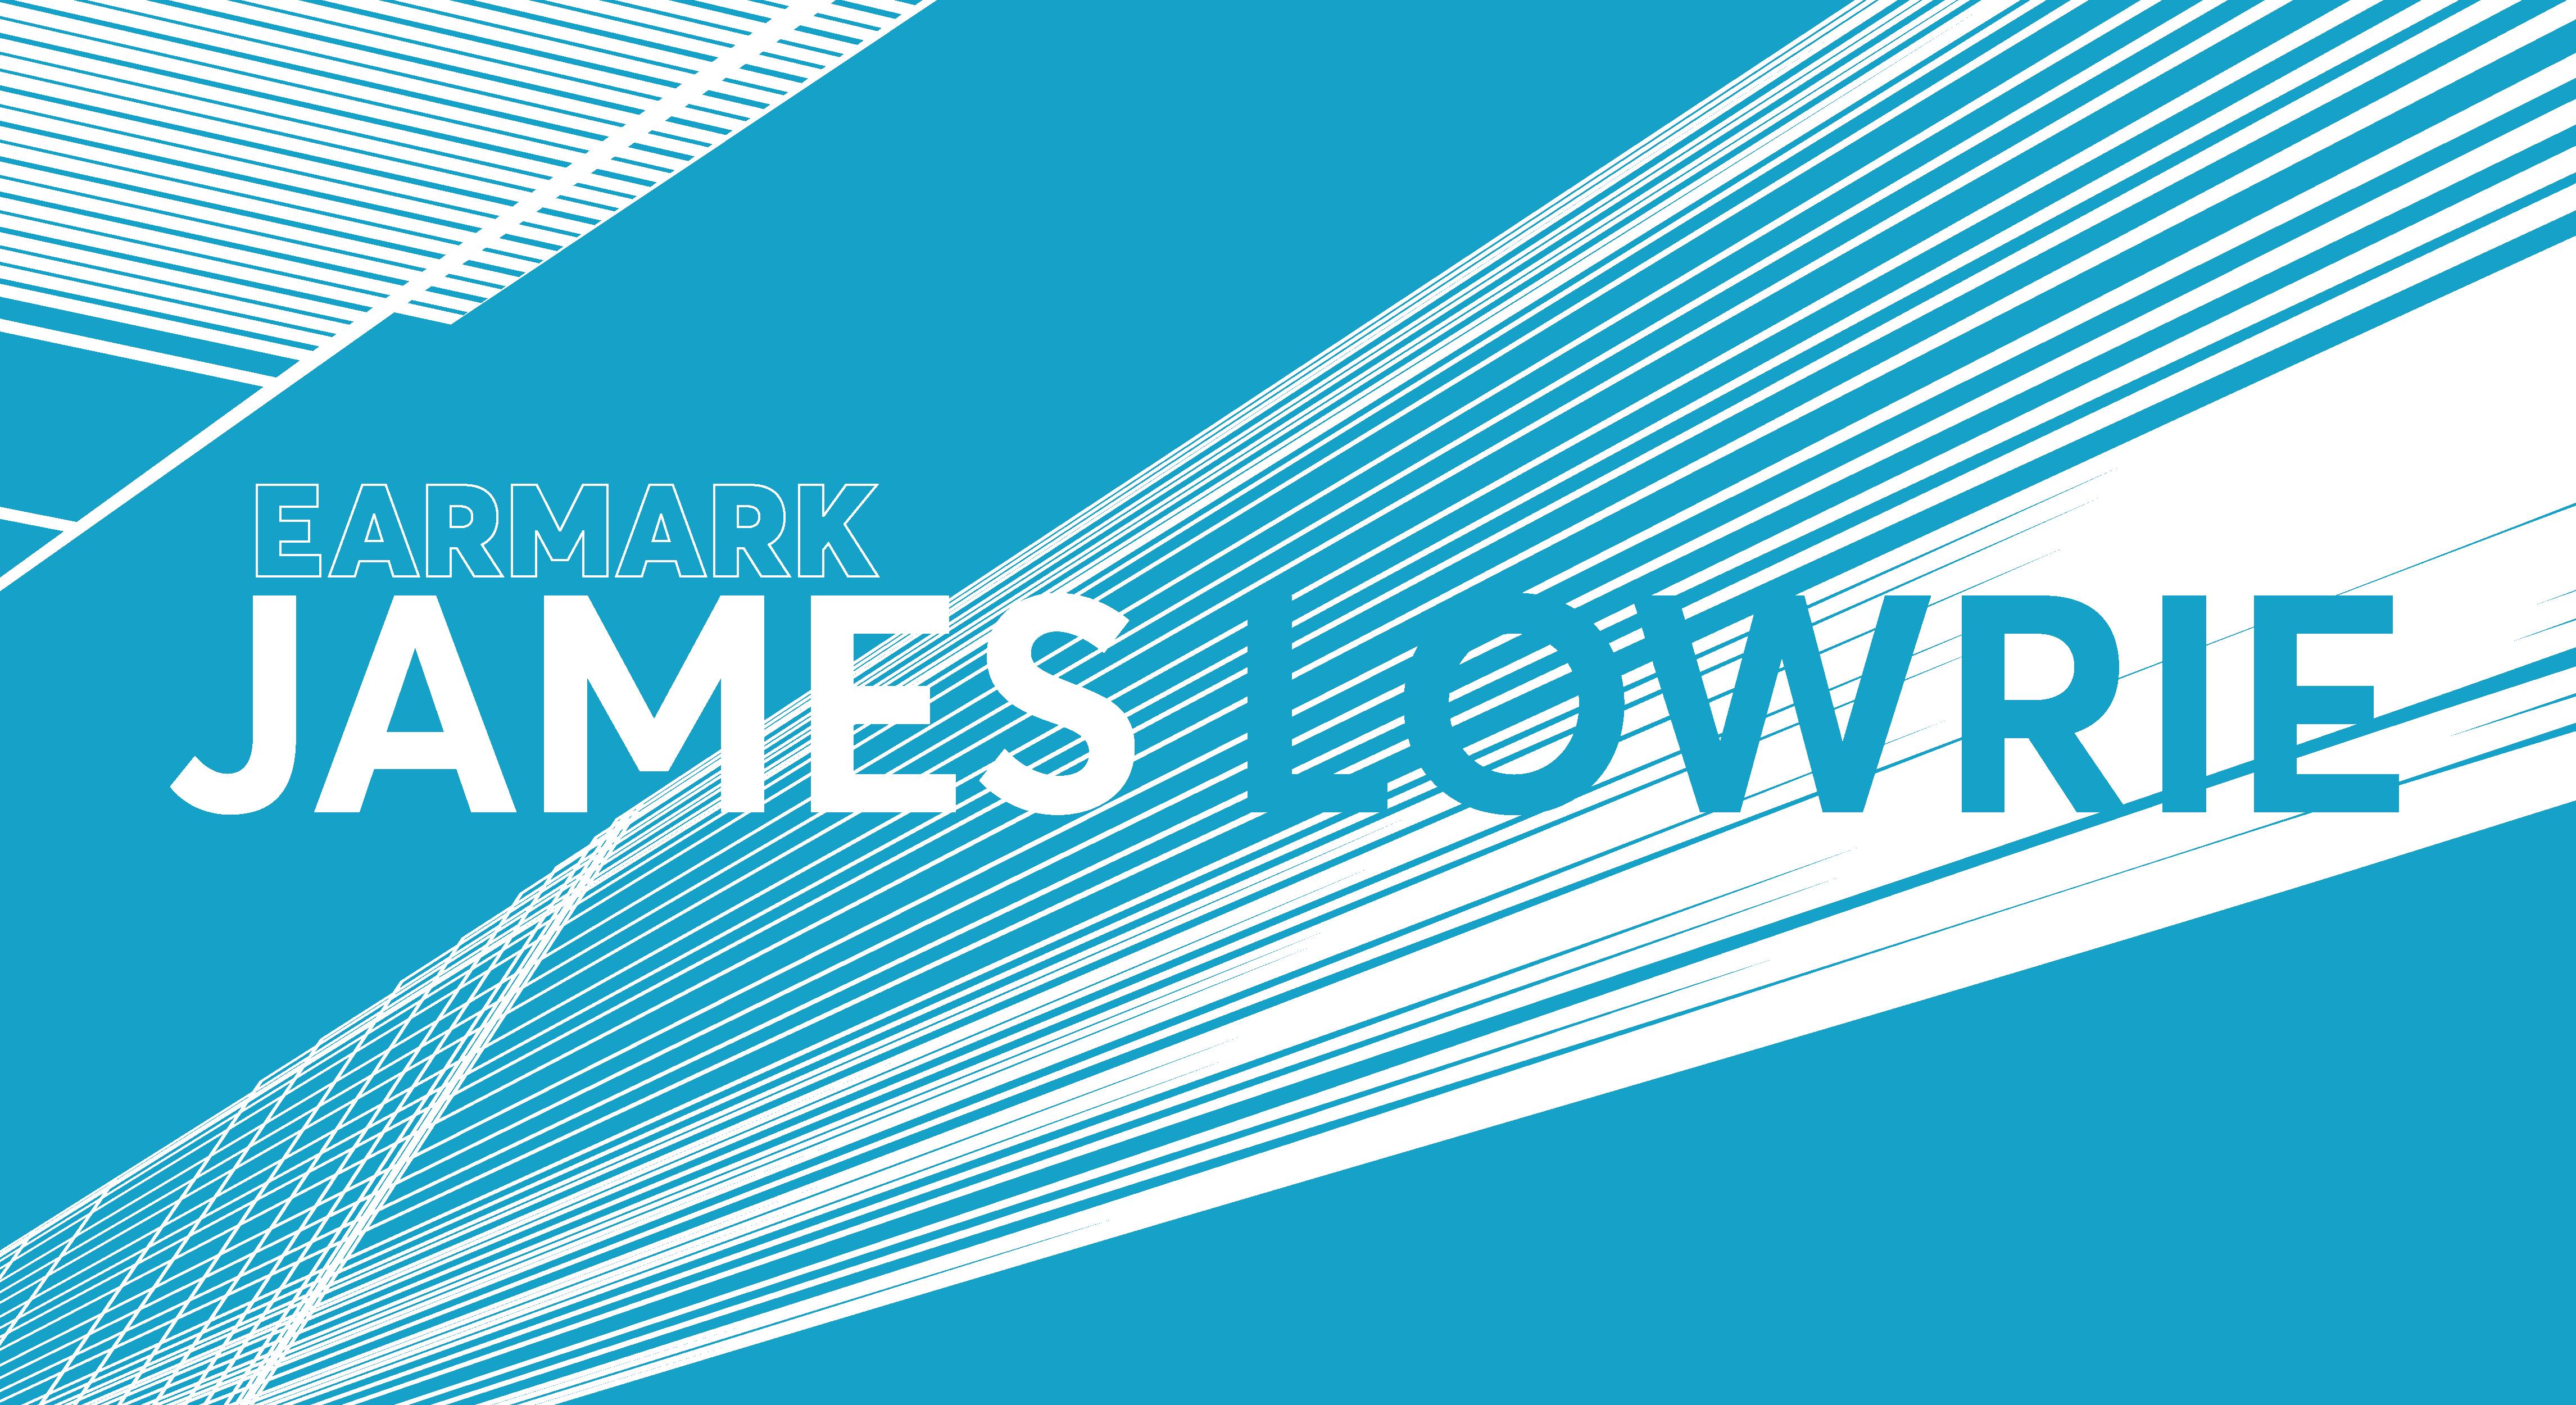 Earmark James Lowrie